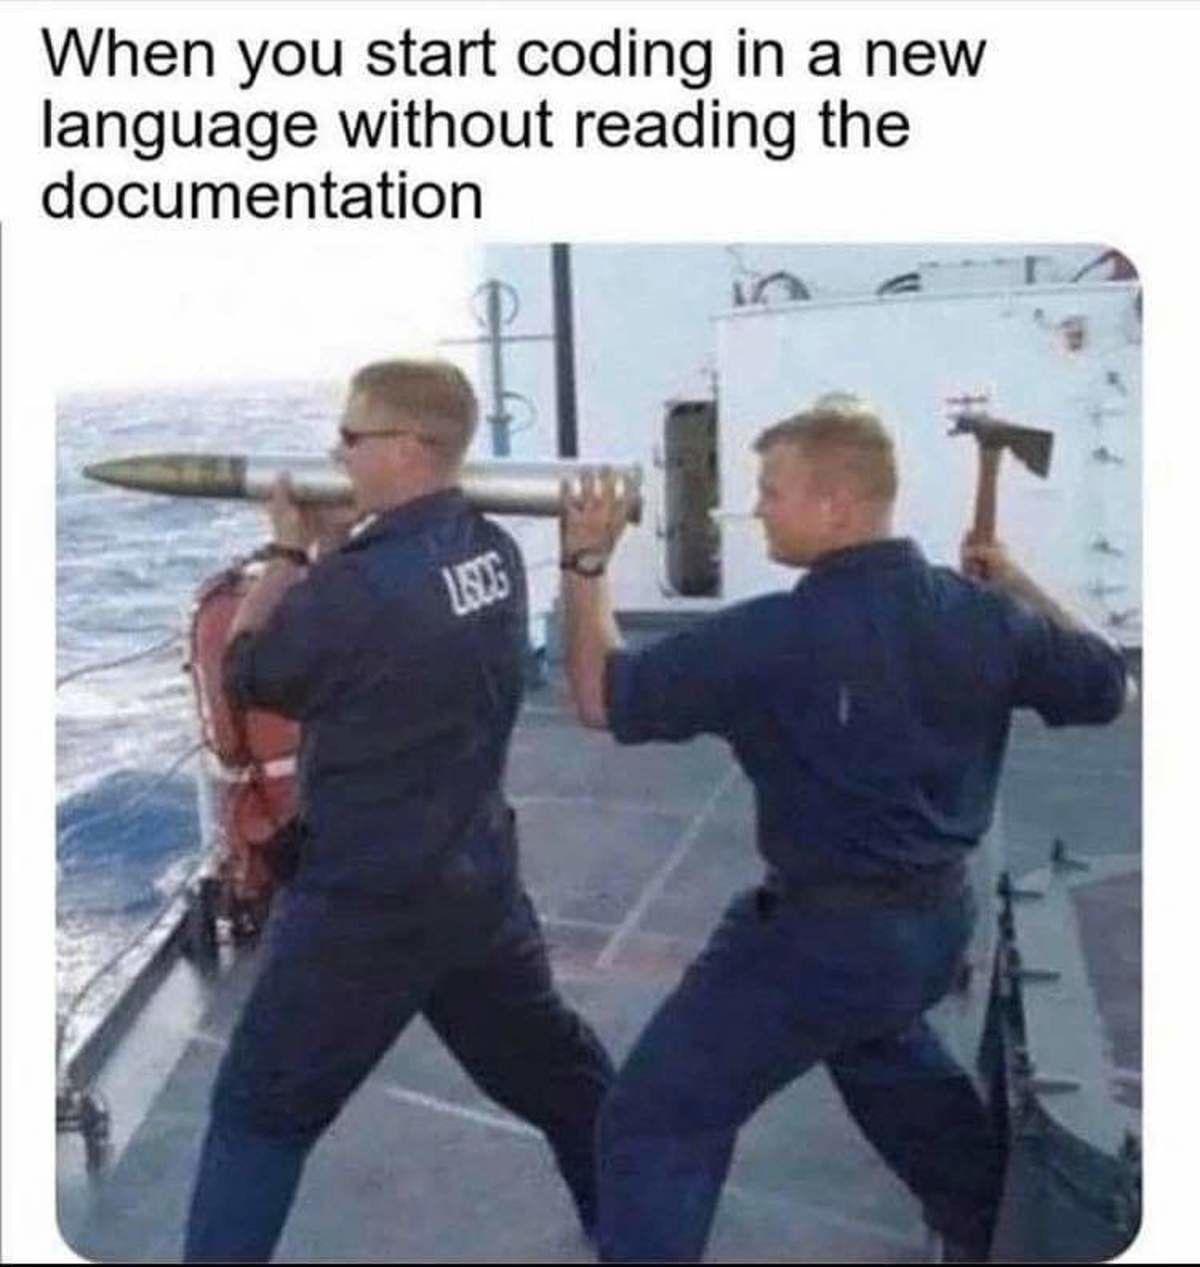 It'll be fine